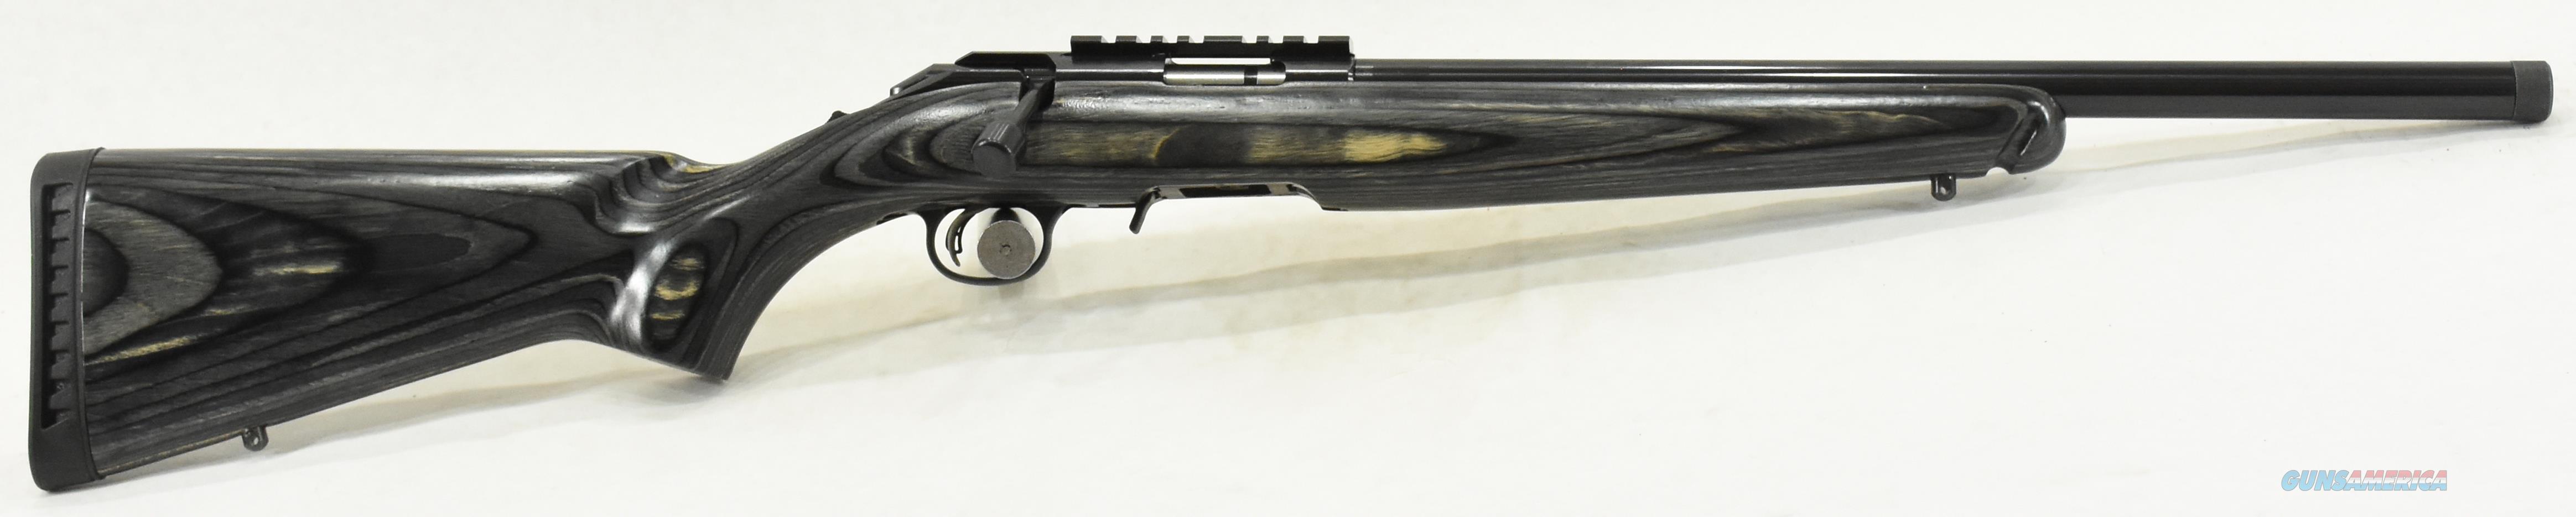 American Target Blk Lam 17HMR 18In  8350  Guns > Rifles > Ruger Rifles > American Rifle